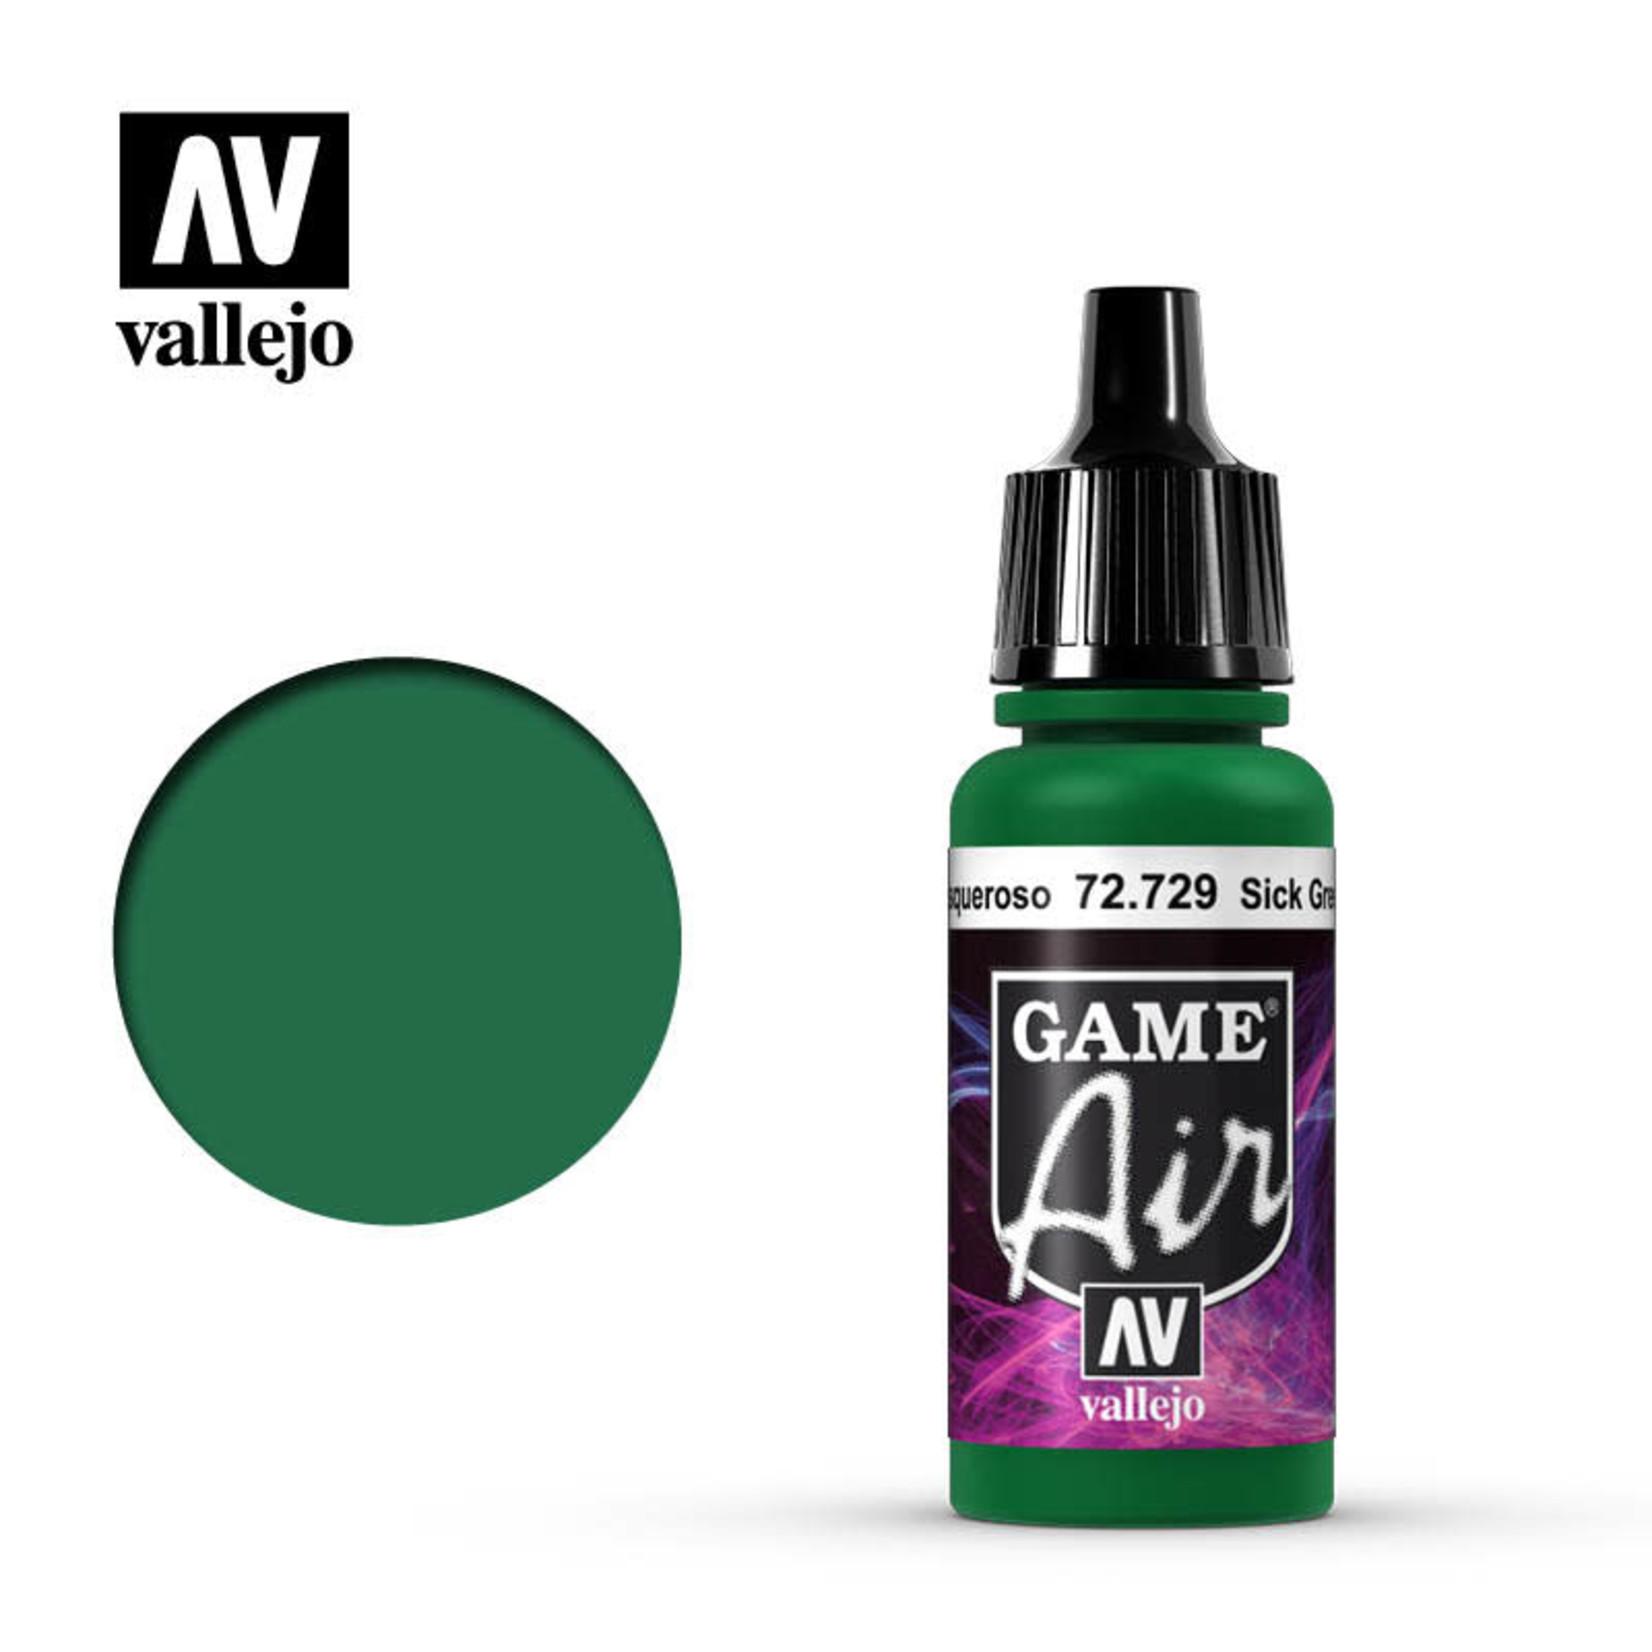 Vallejo Vallejo: Game Air: Sick Green